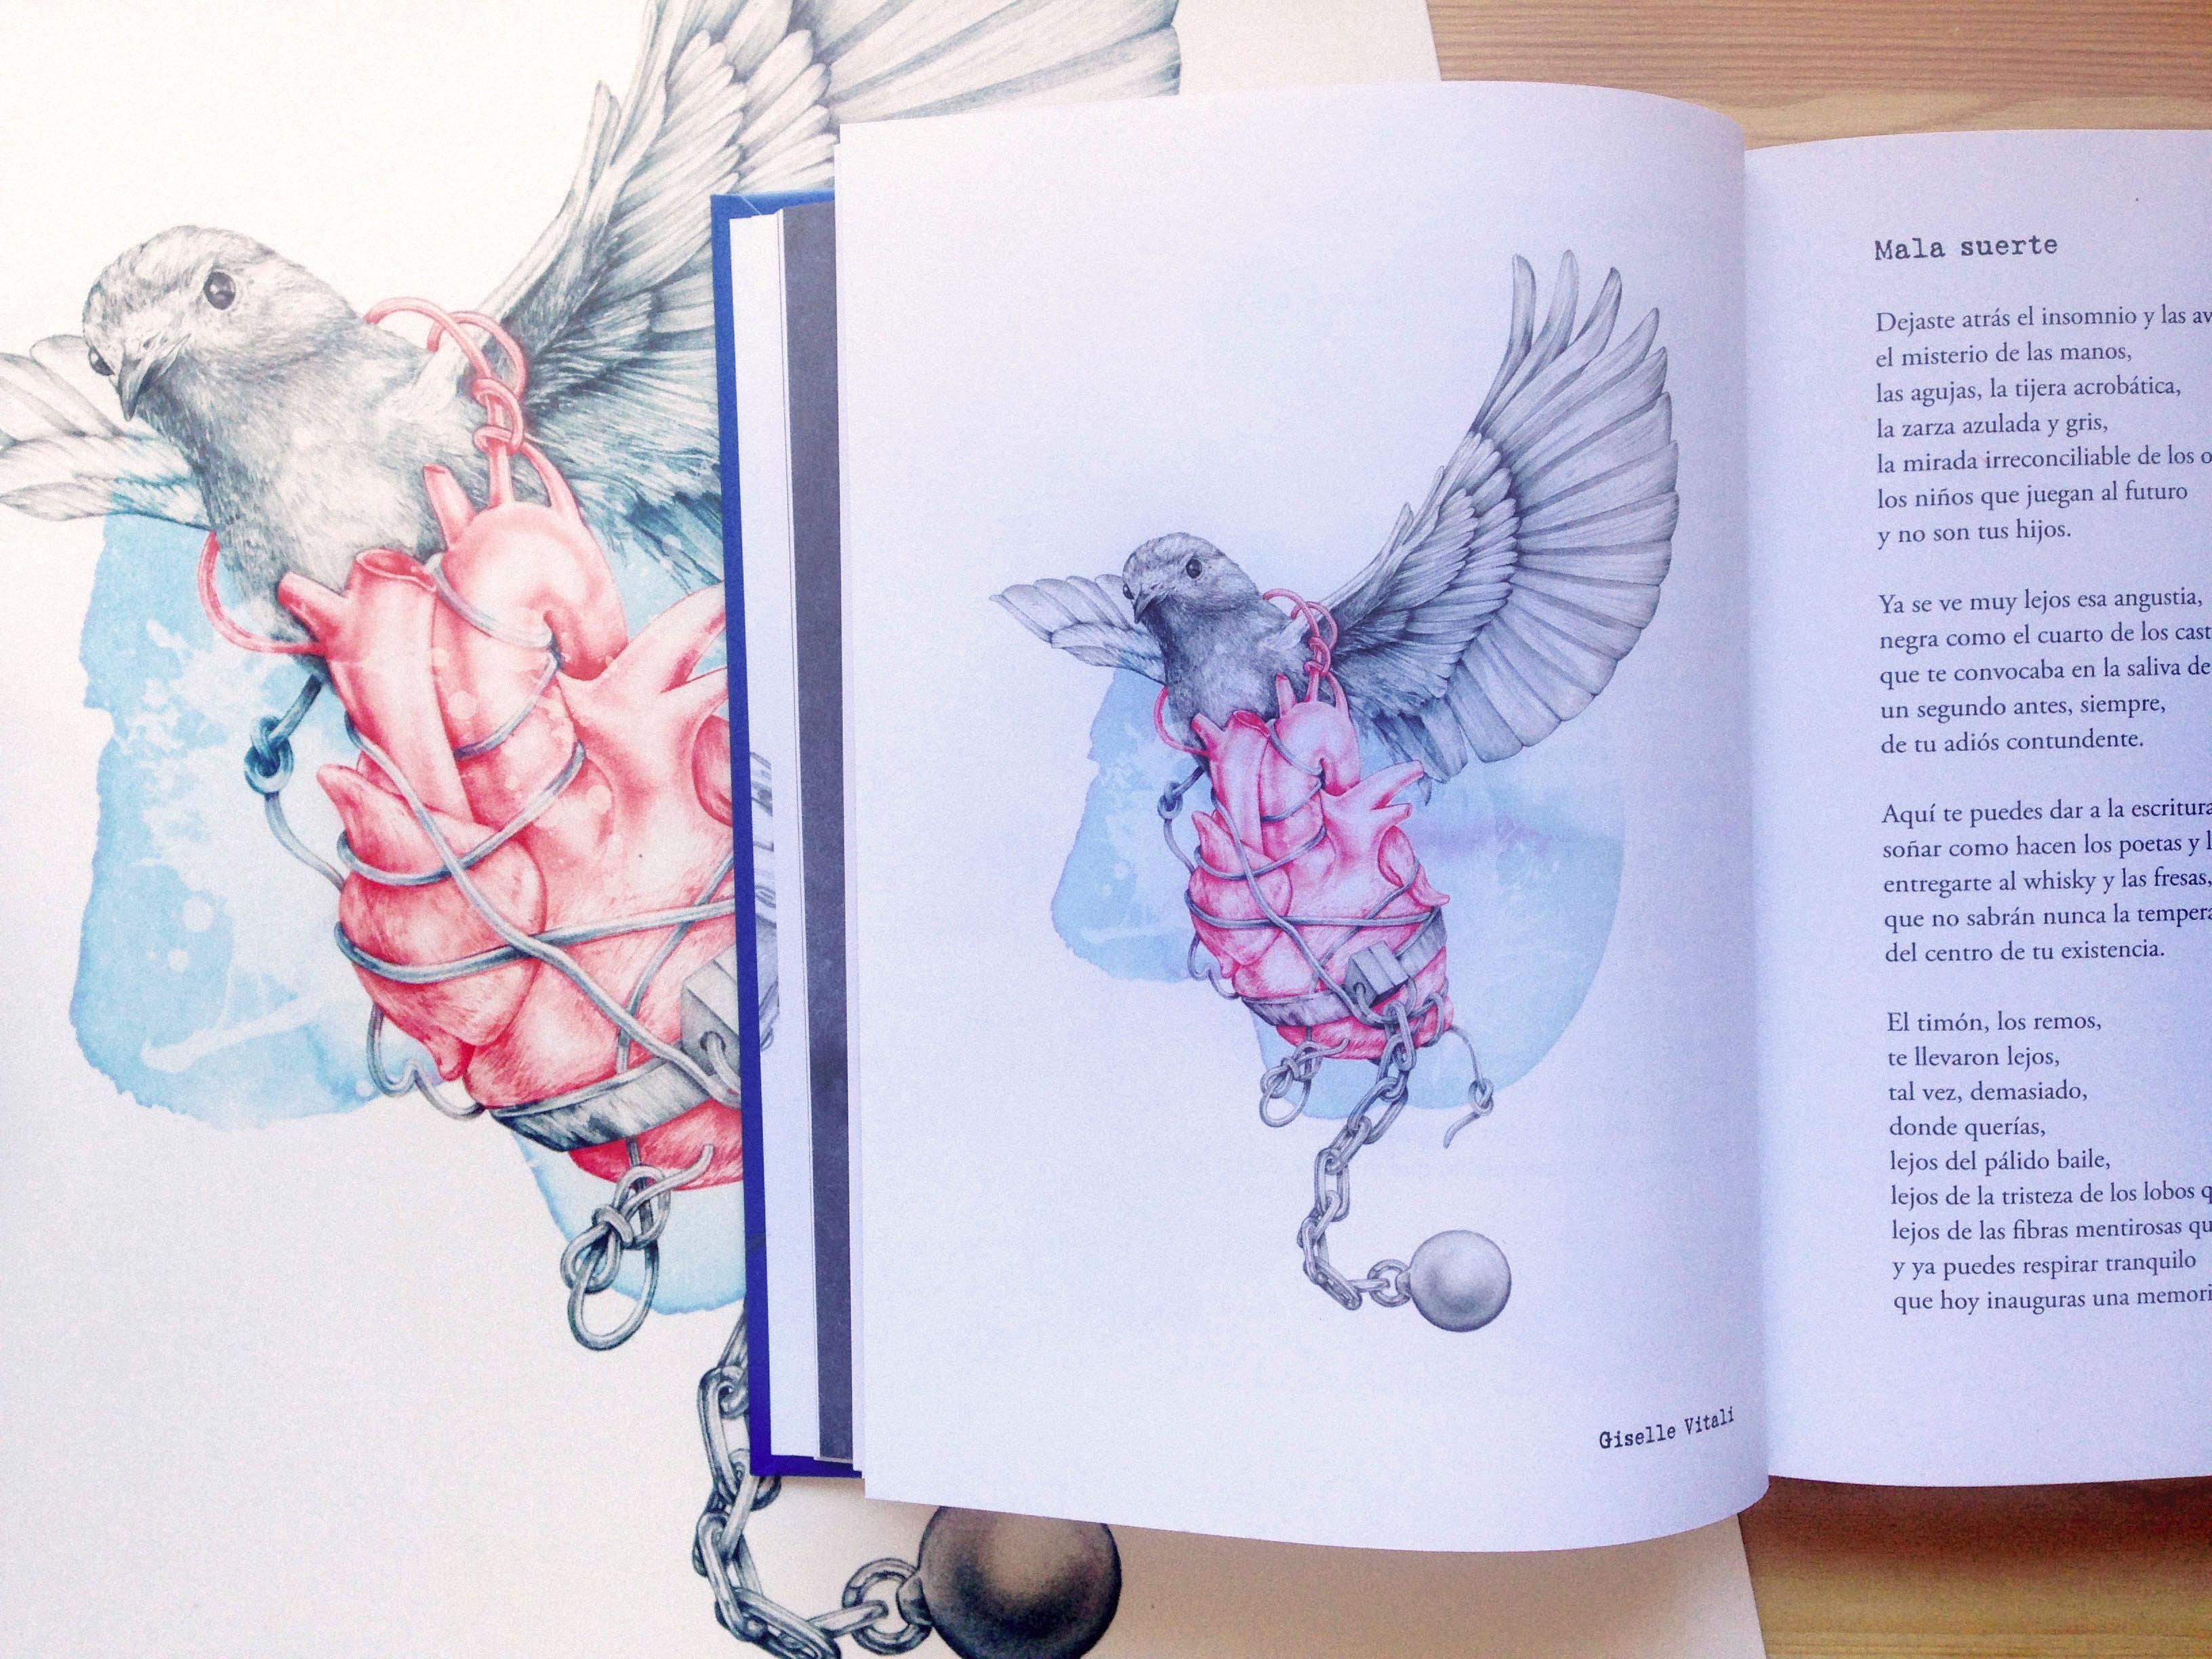 apnea ilustrada ruben tejerina - giselle vitali